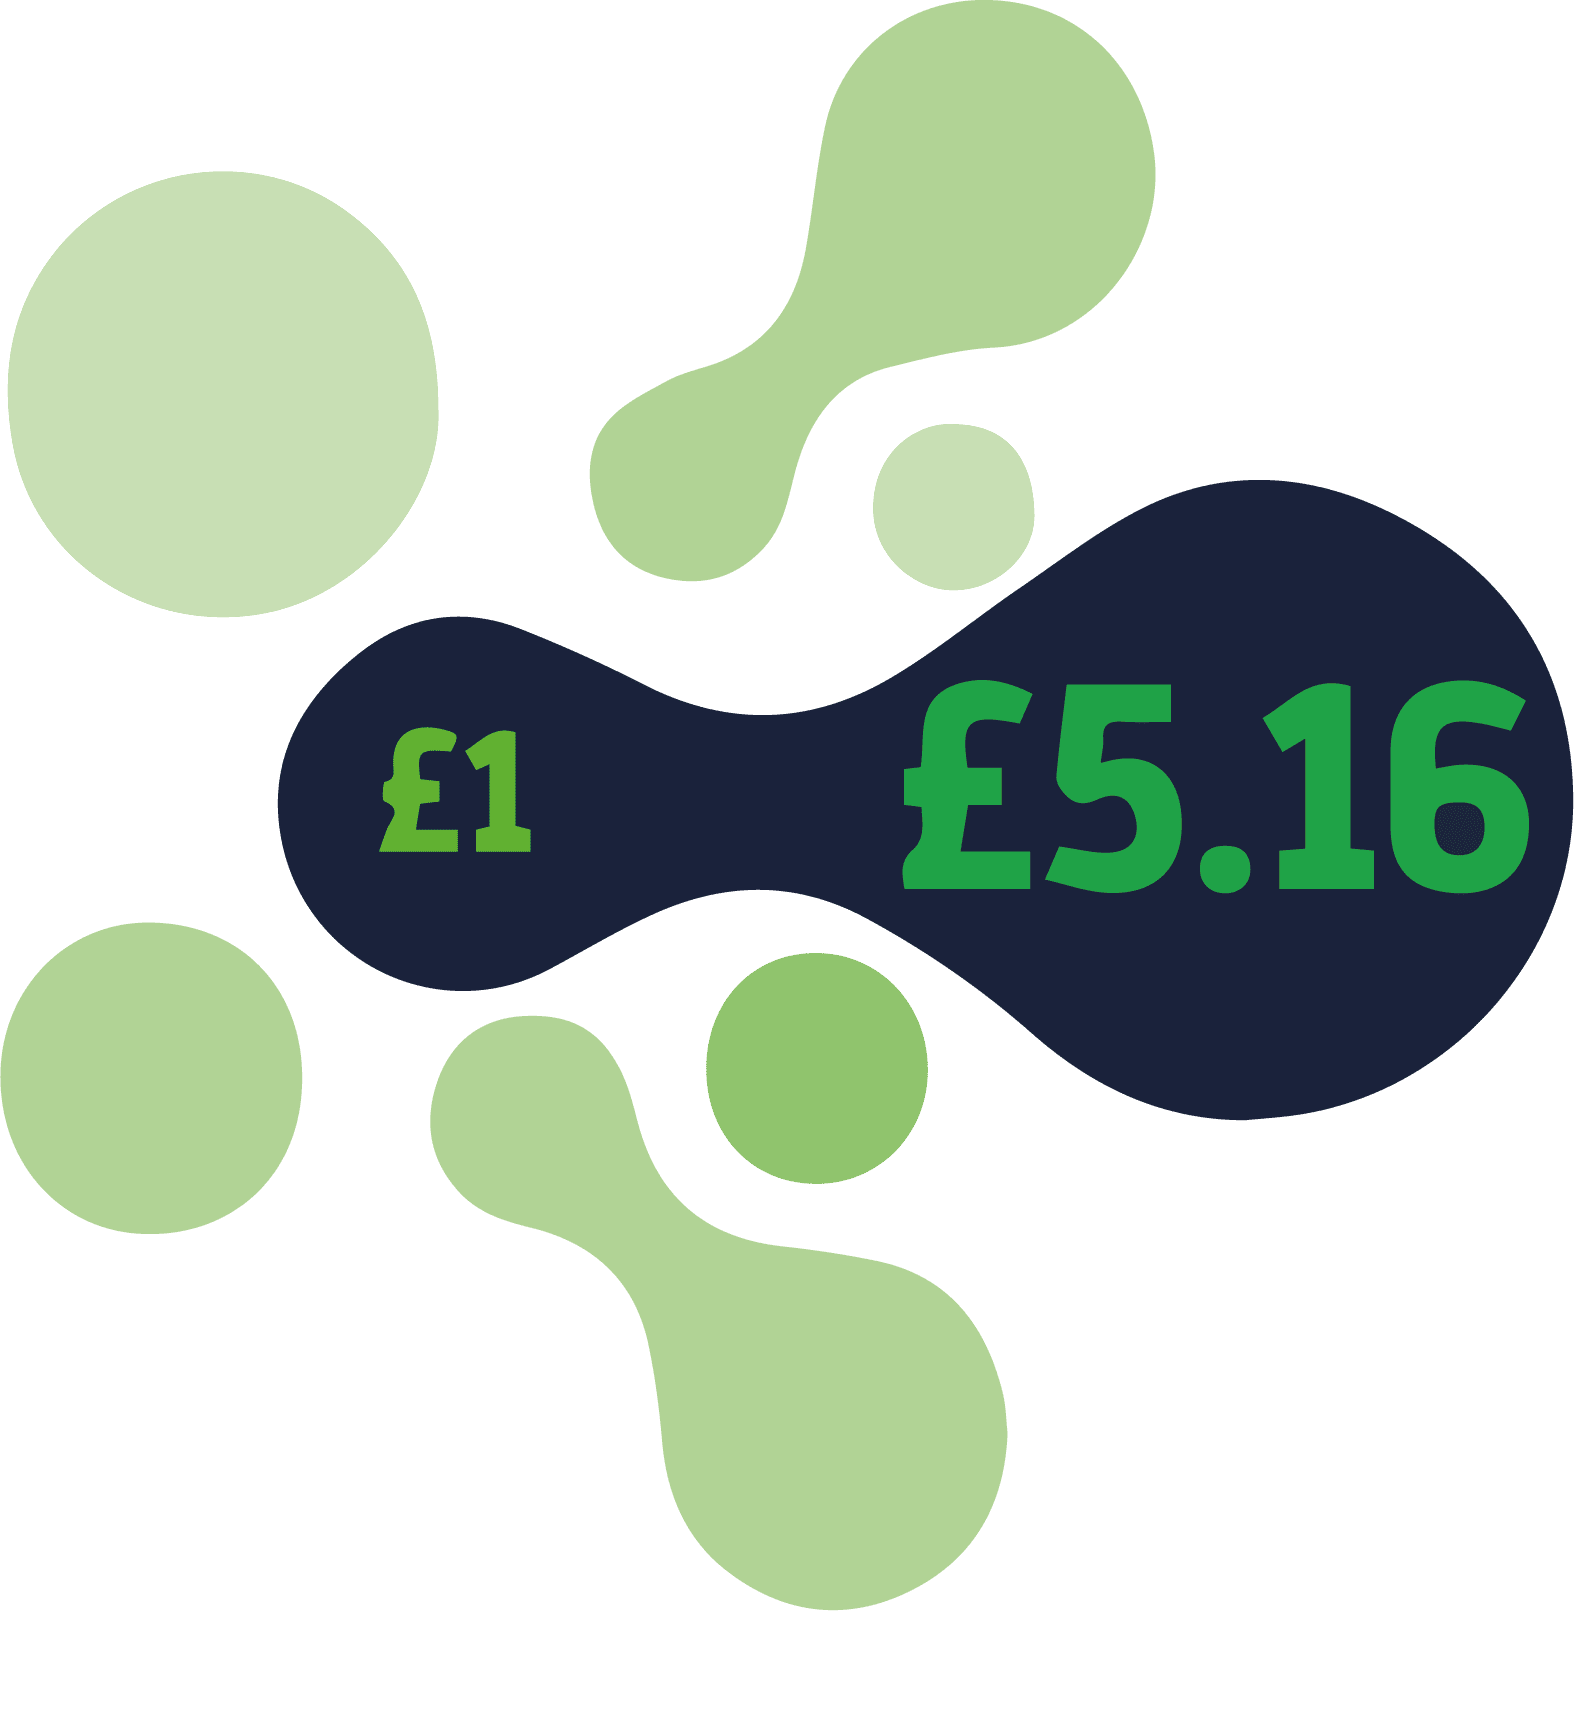 Funding leveraged (002)